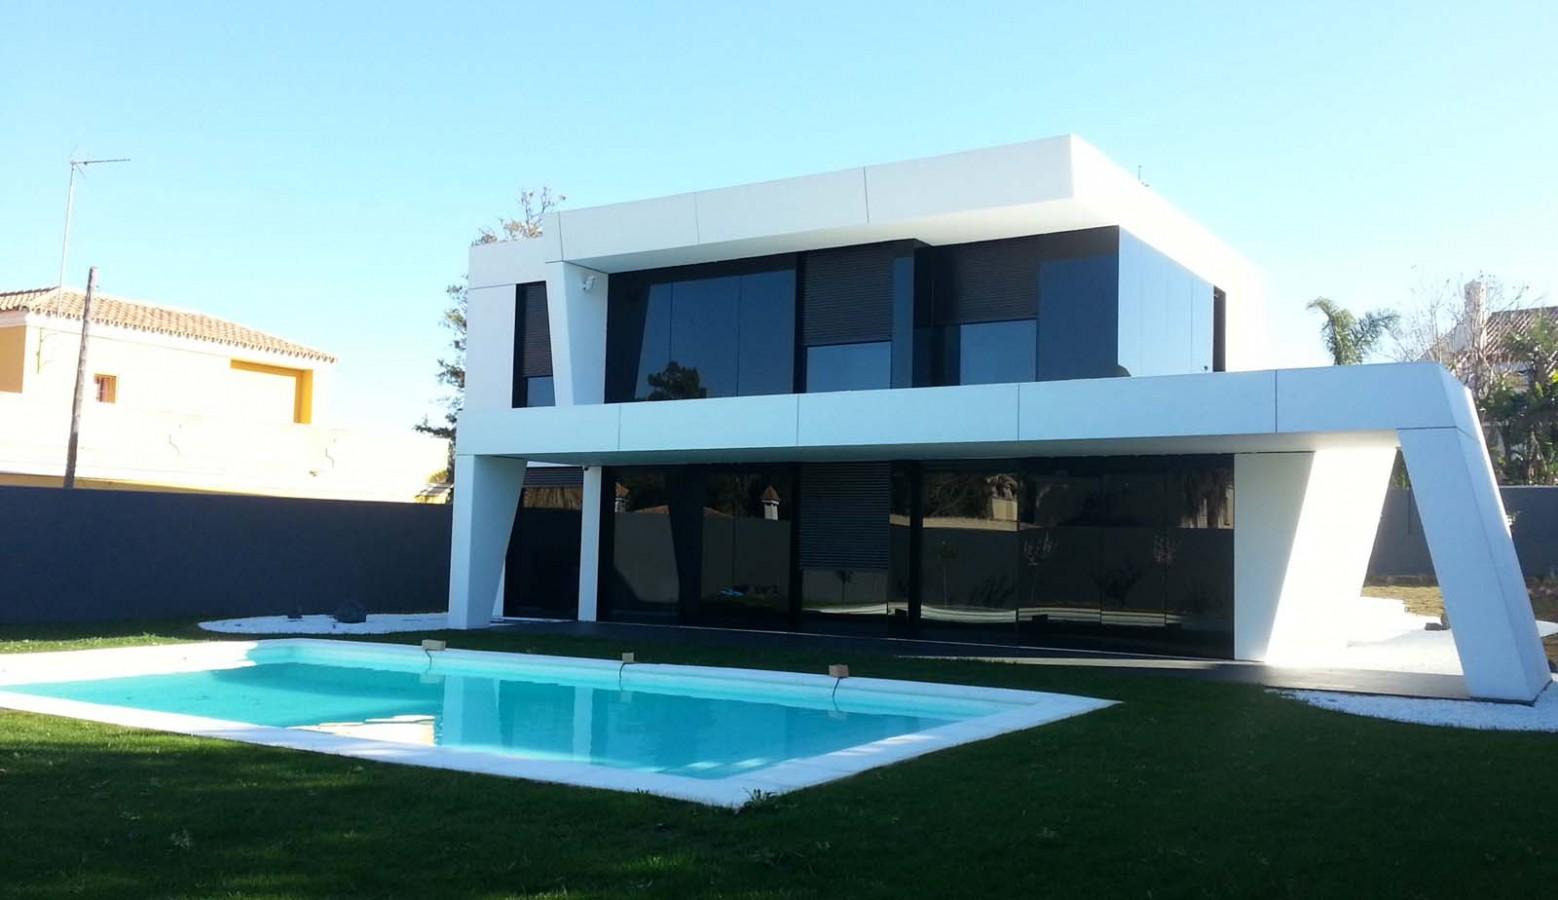 Decoarq arquitectura decorativa - Casas prefabricadas de diseno ...